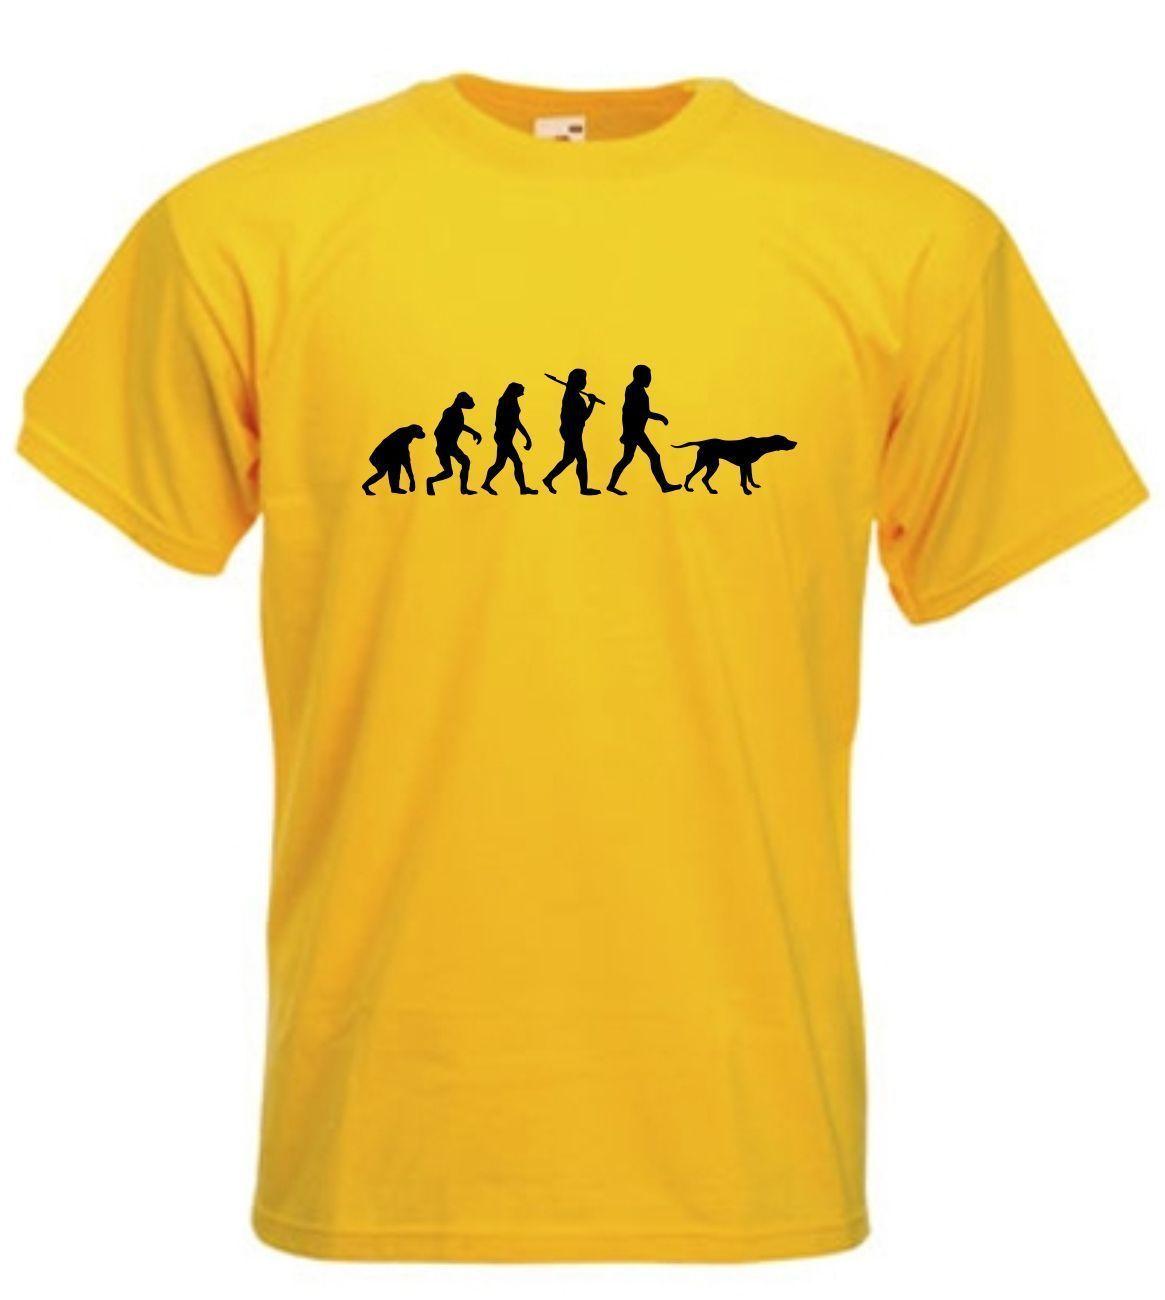 abda4aa2 EVOLUTION WALK THE POINTER T-SHIRT SIZES S-XXL Funny free shipping Unisex  Casual Tshirt top